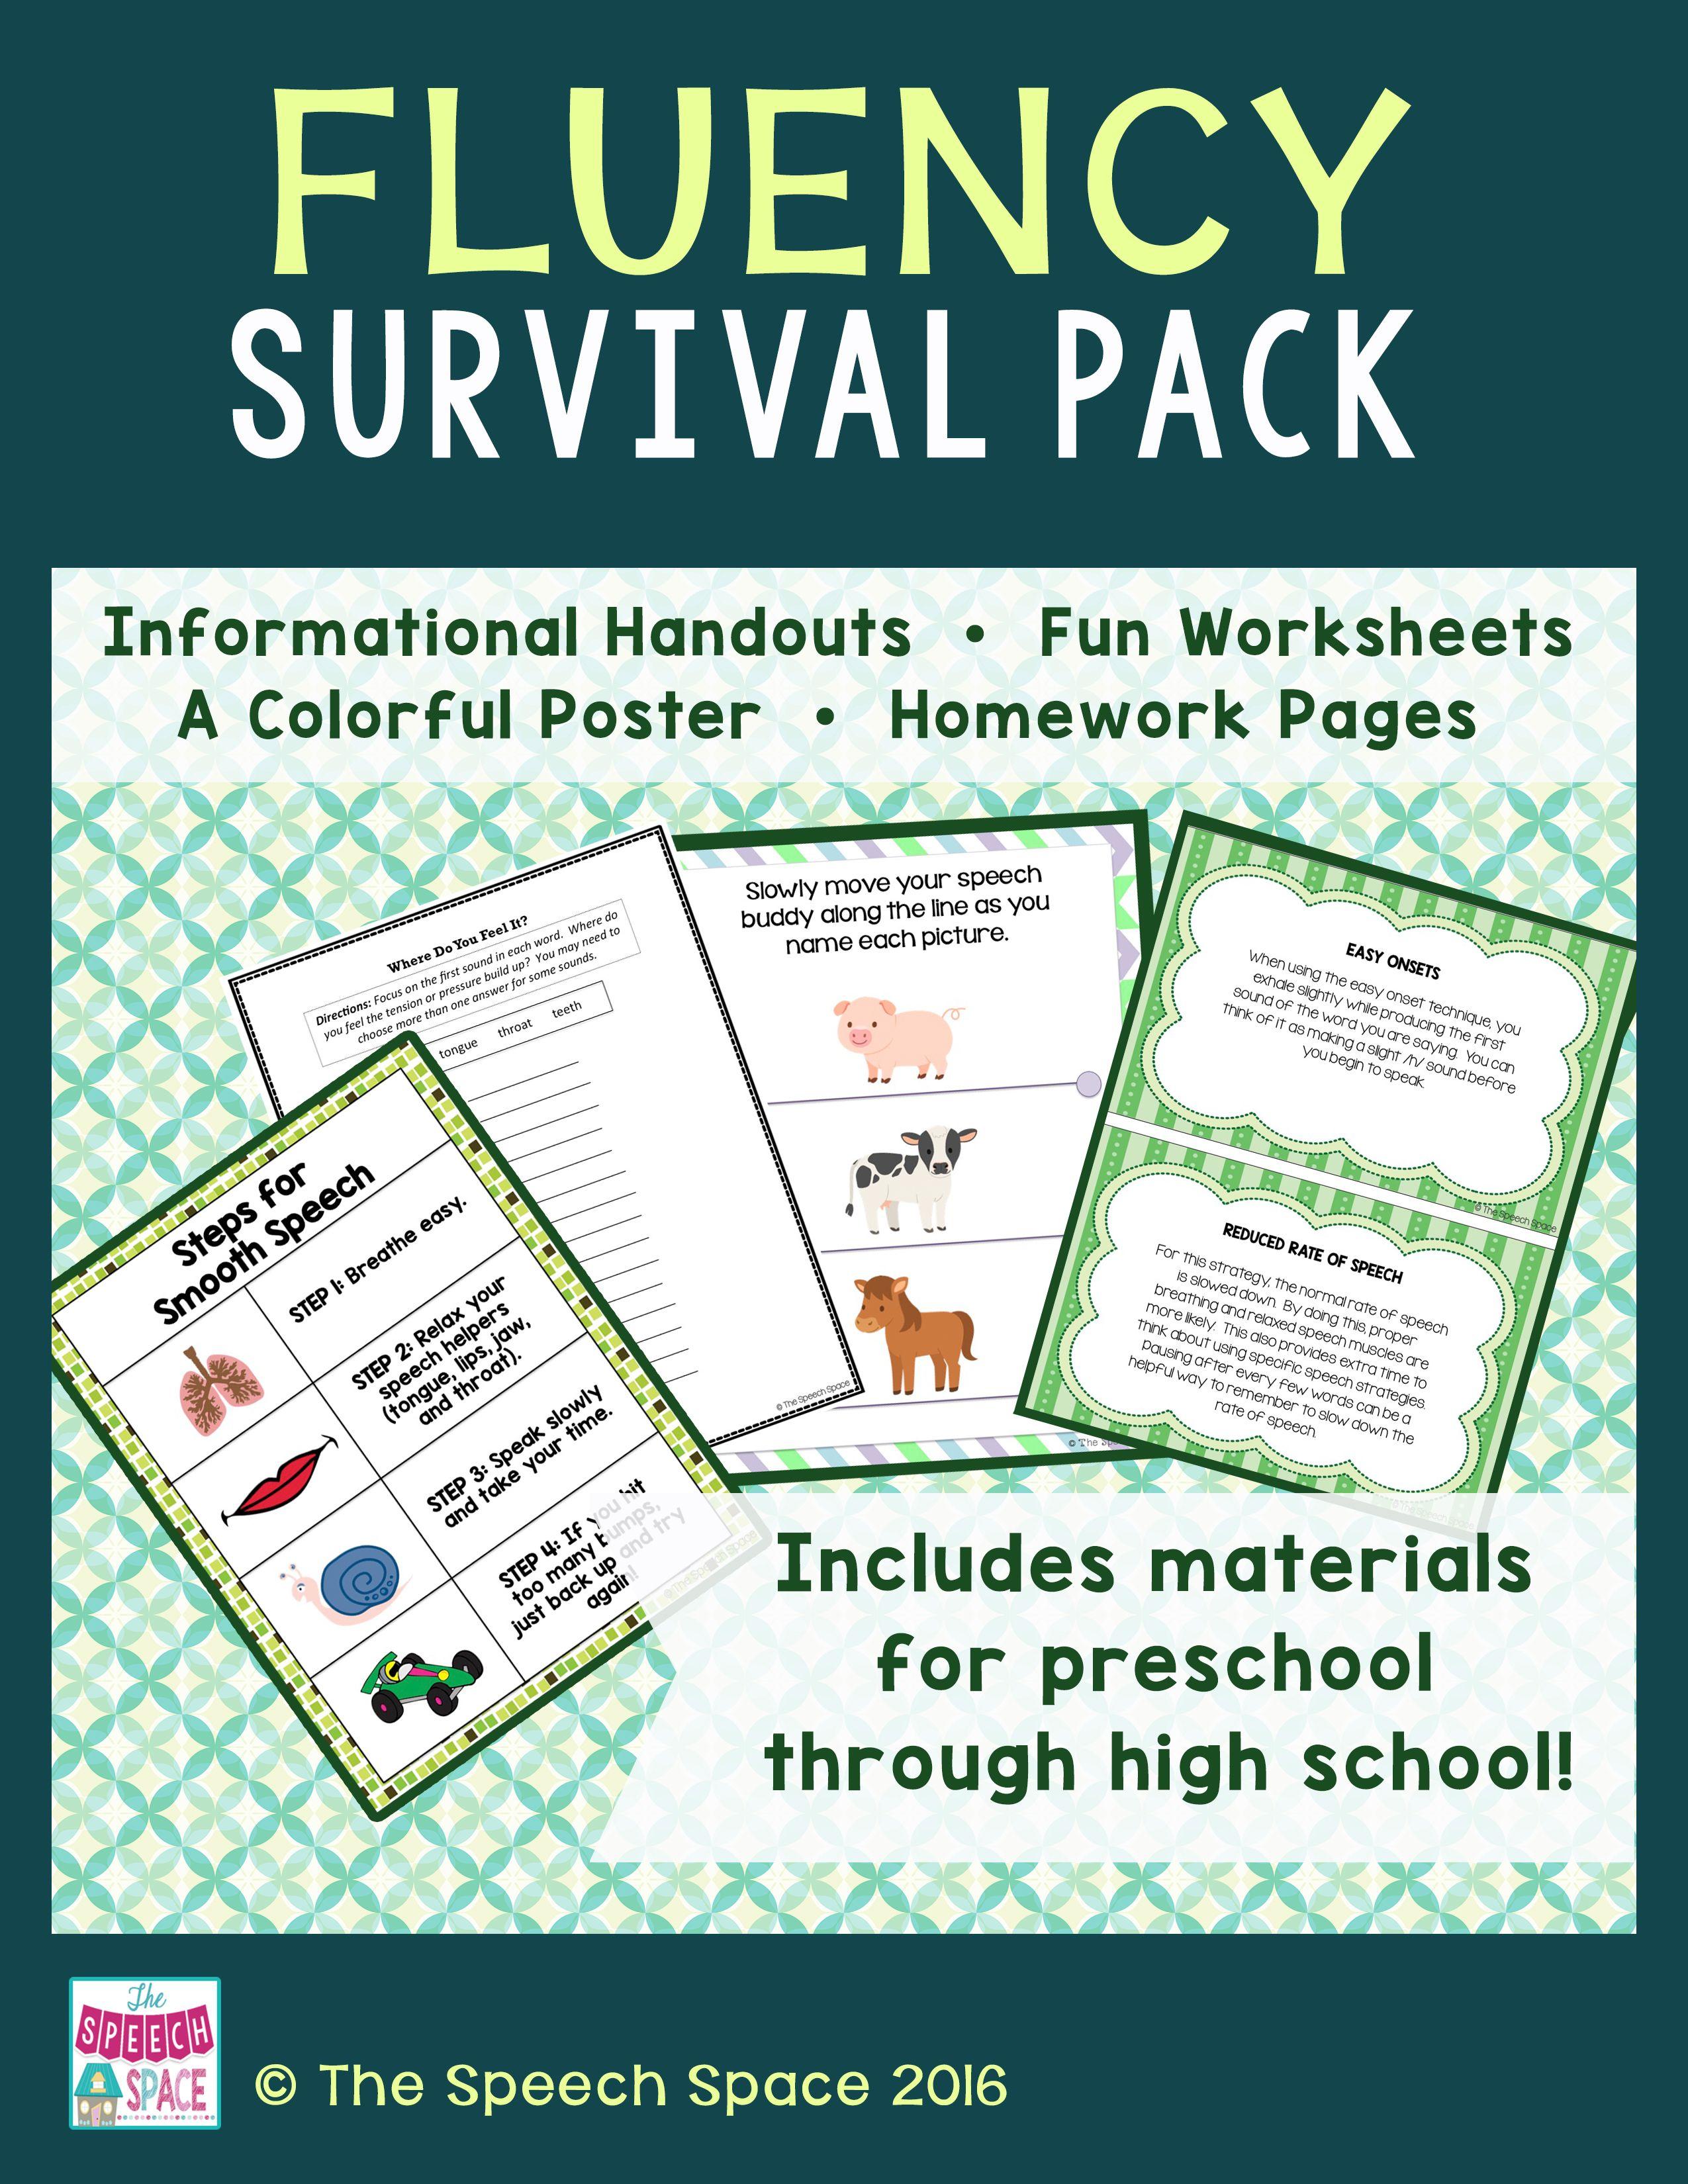 Fluency Survival Pack